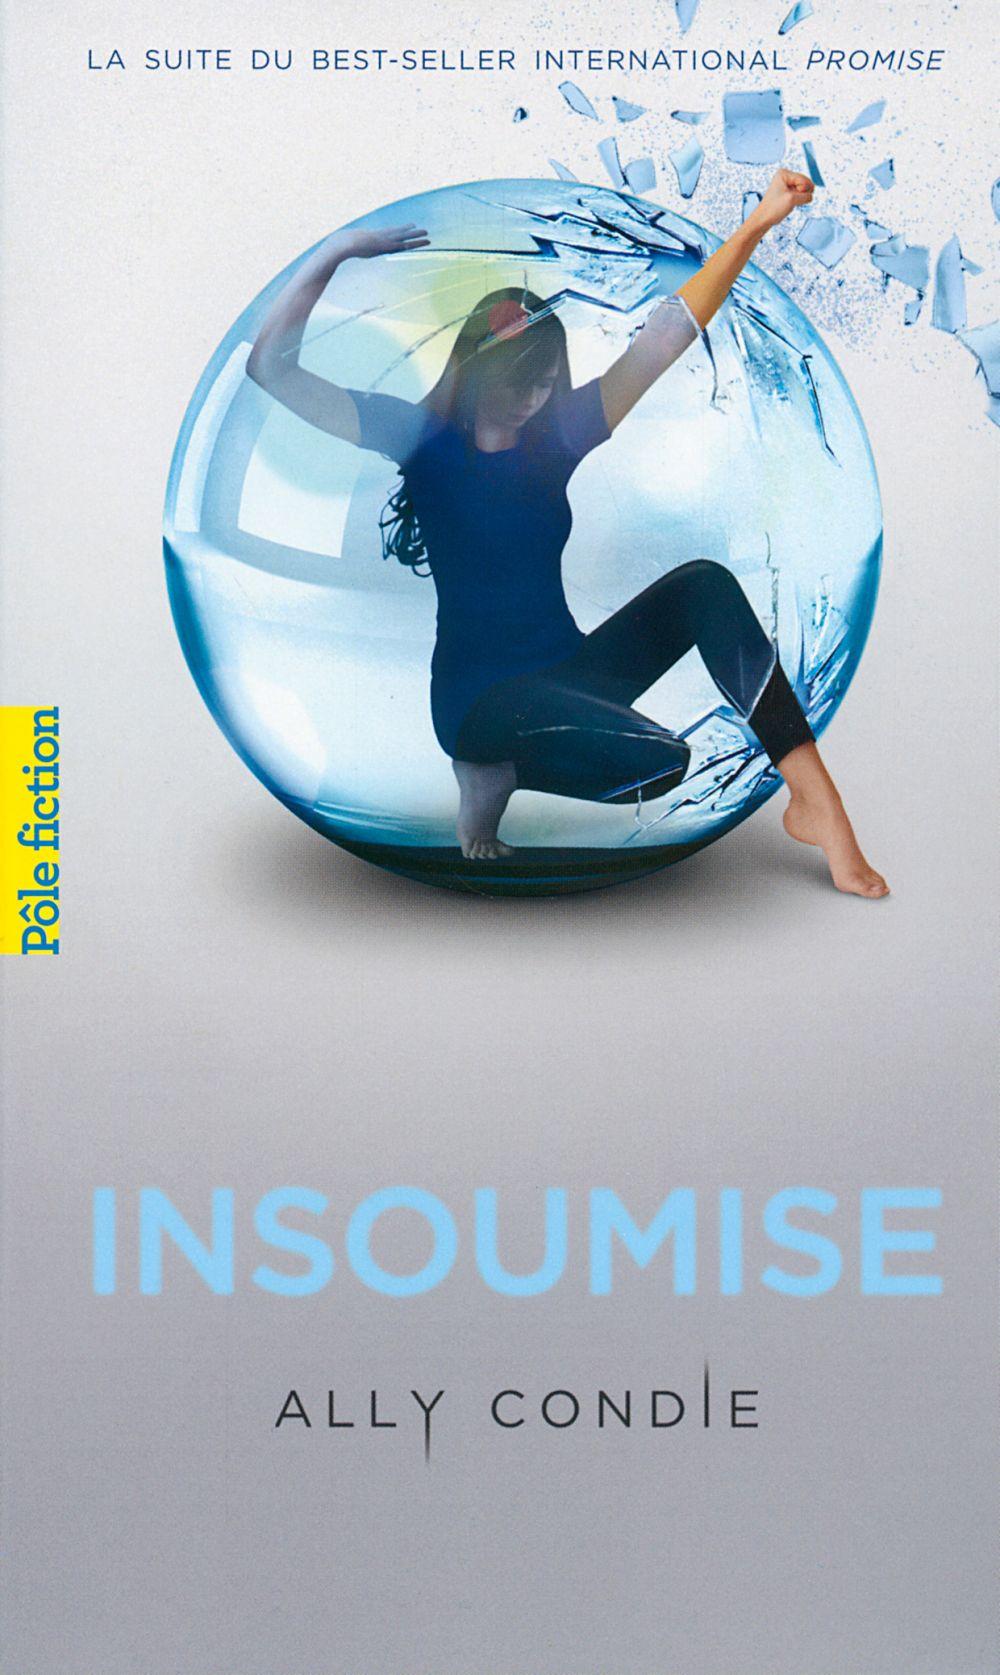 Trilogie Promise (Tome 2) - Insoumise | Condie, Ally. Auteur